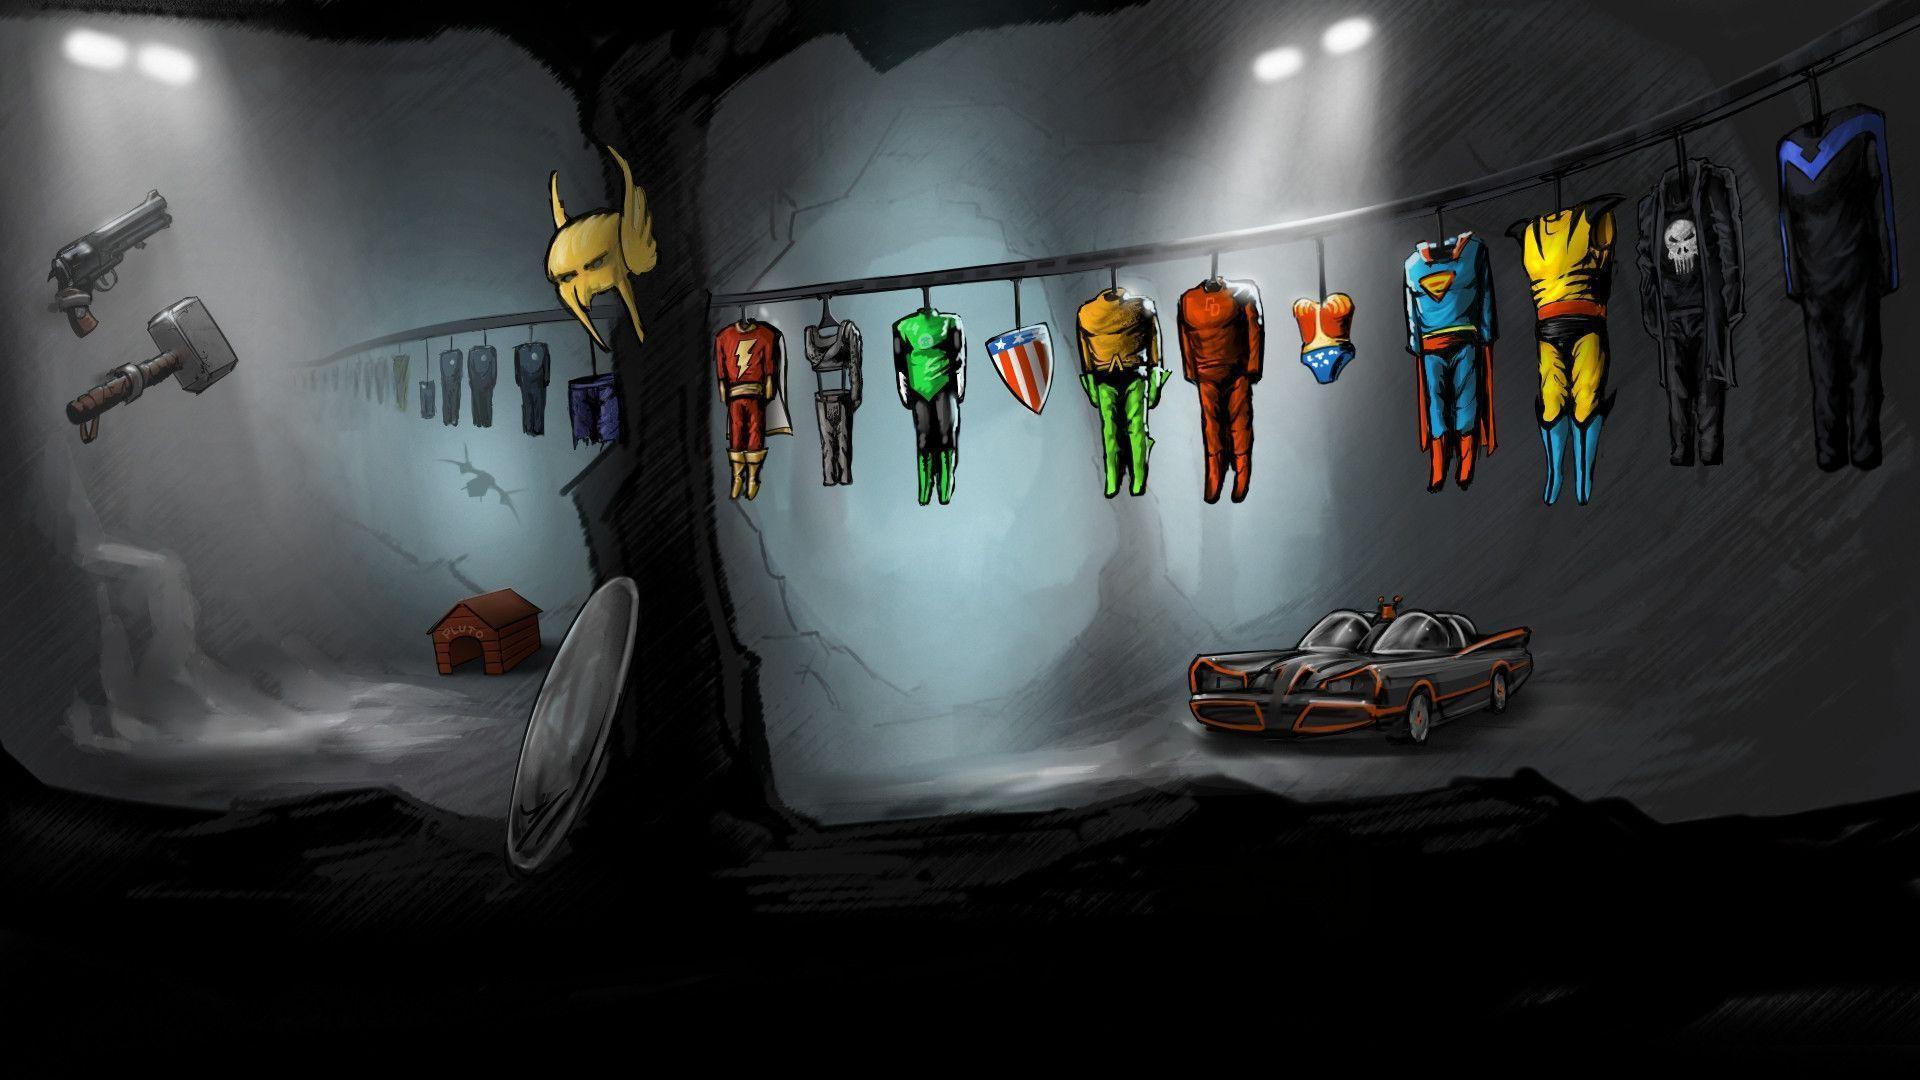 IPhone Wallpaper HD Superhero